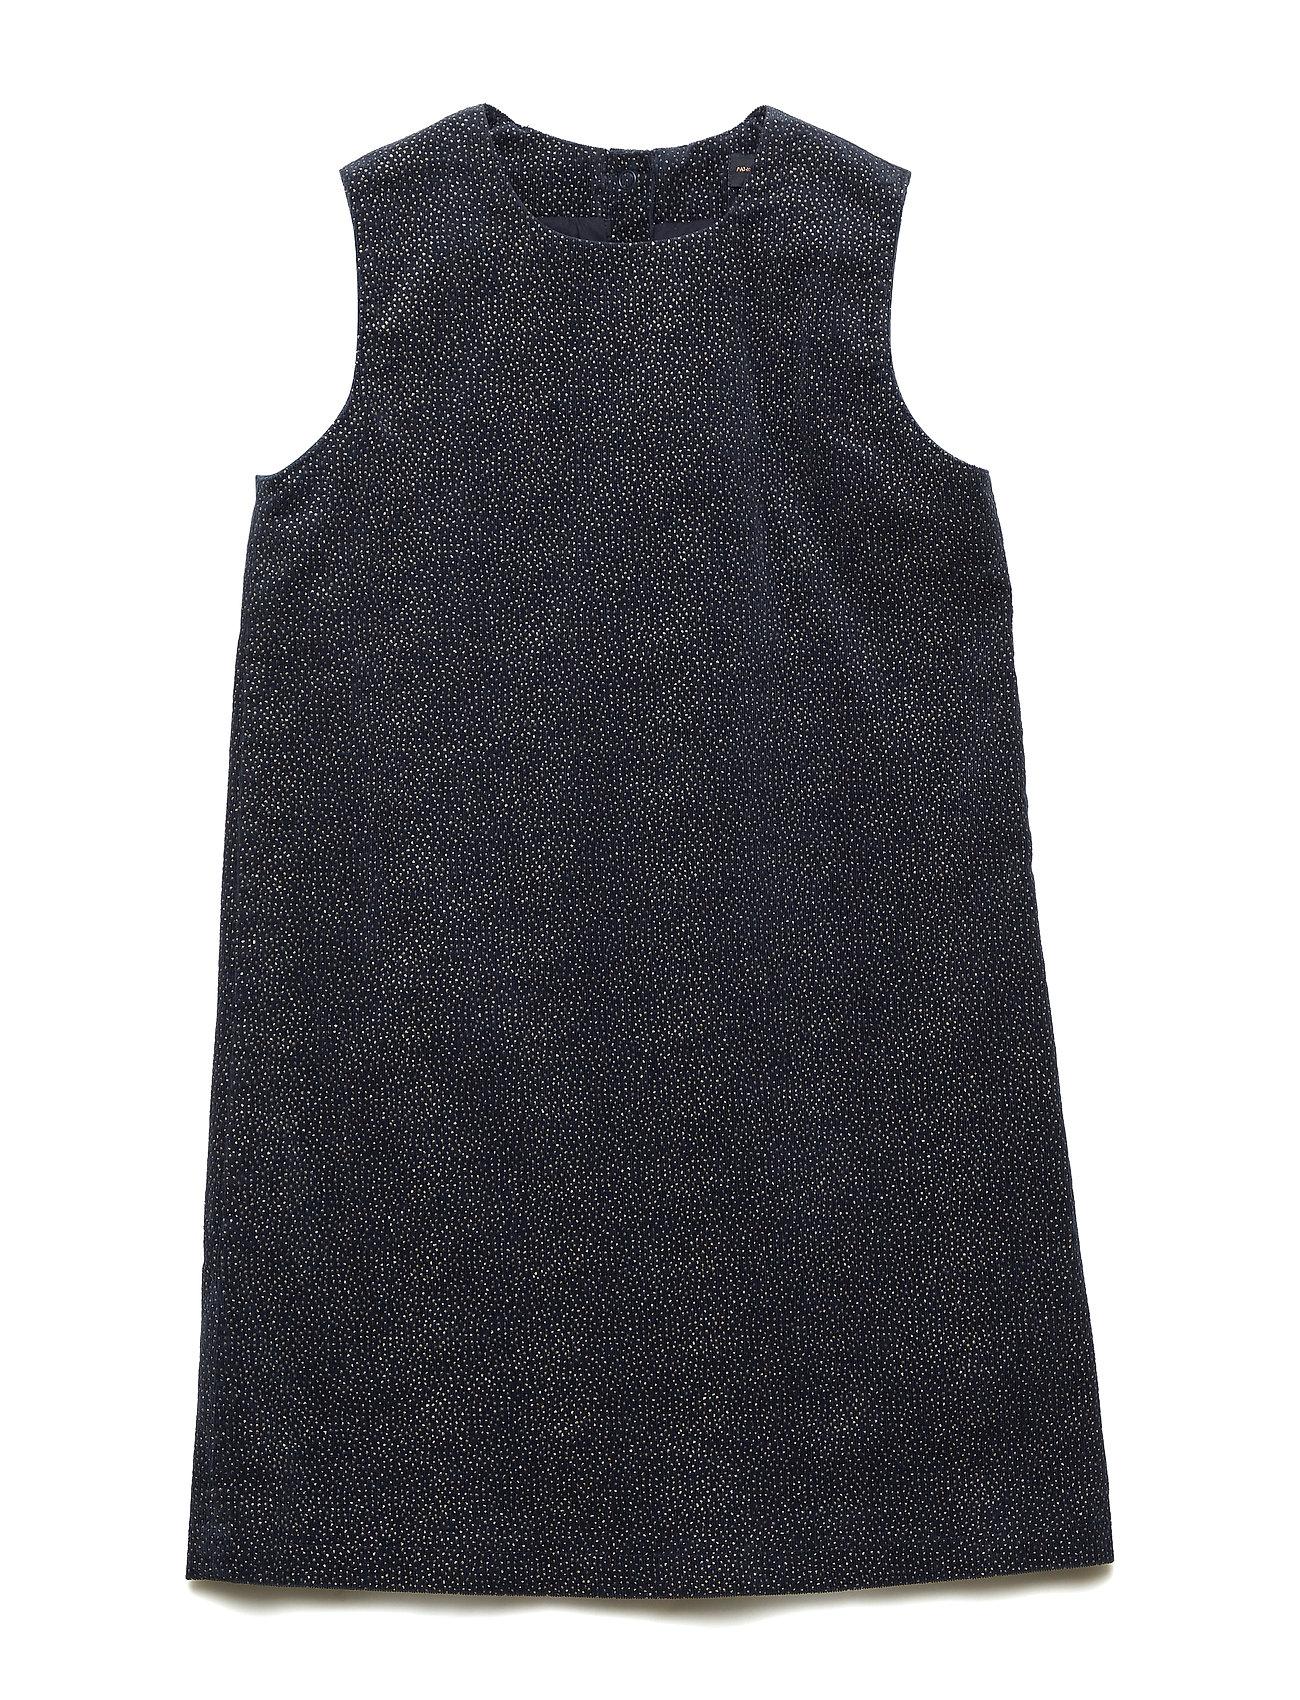 Mini A Ture Inaya Dress, MK - SKY CAPTAIN BLUE